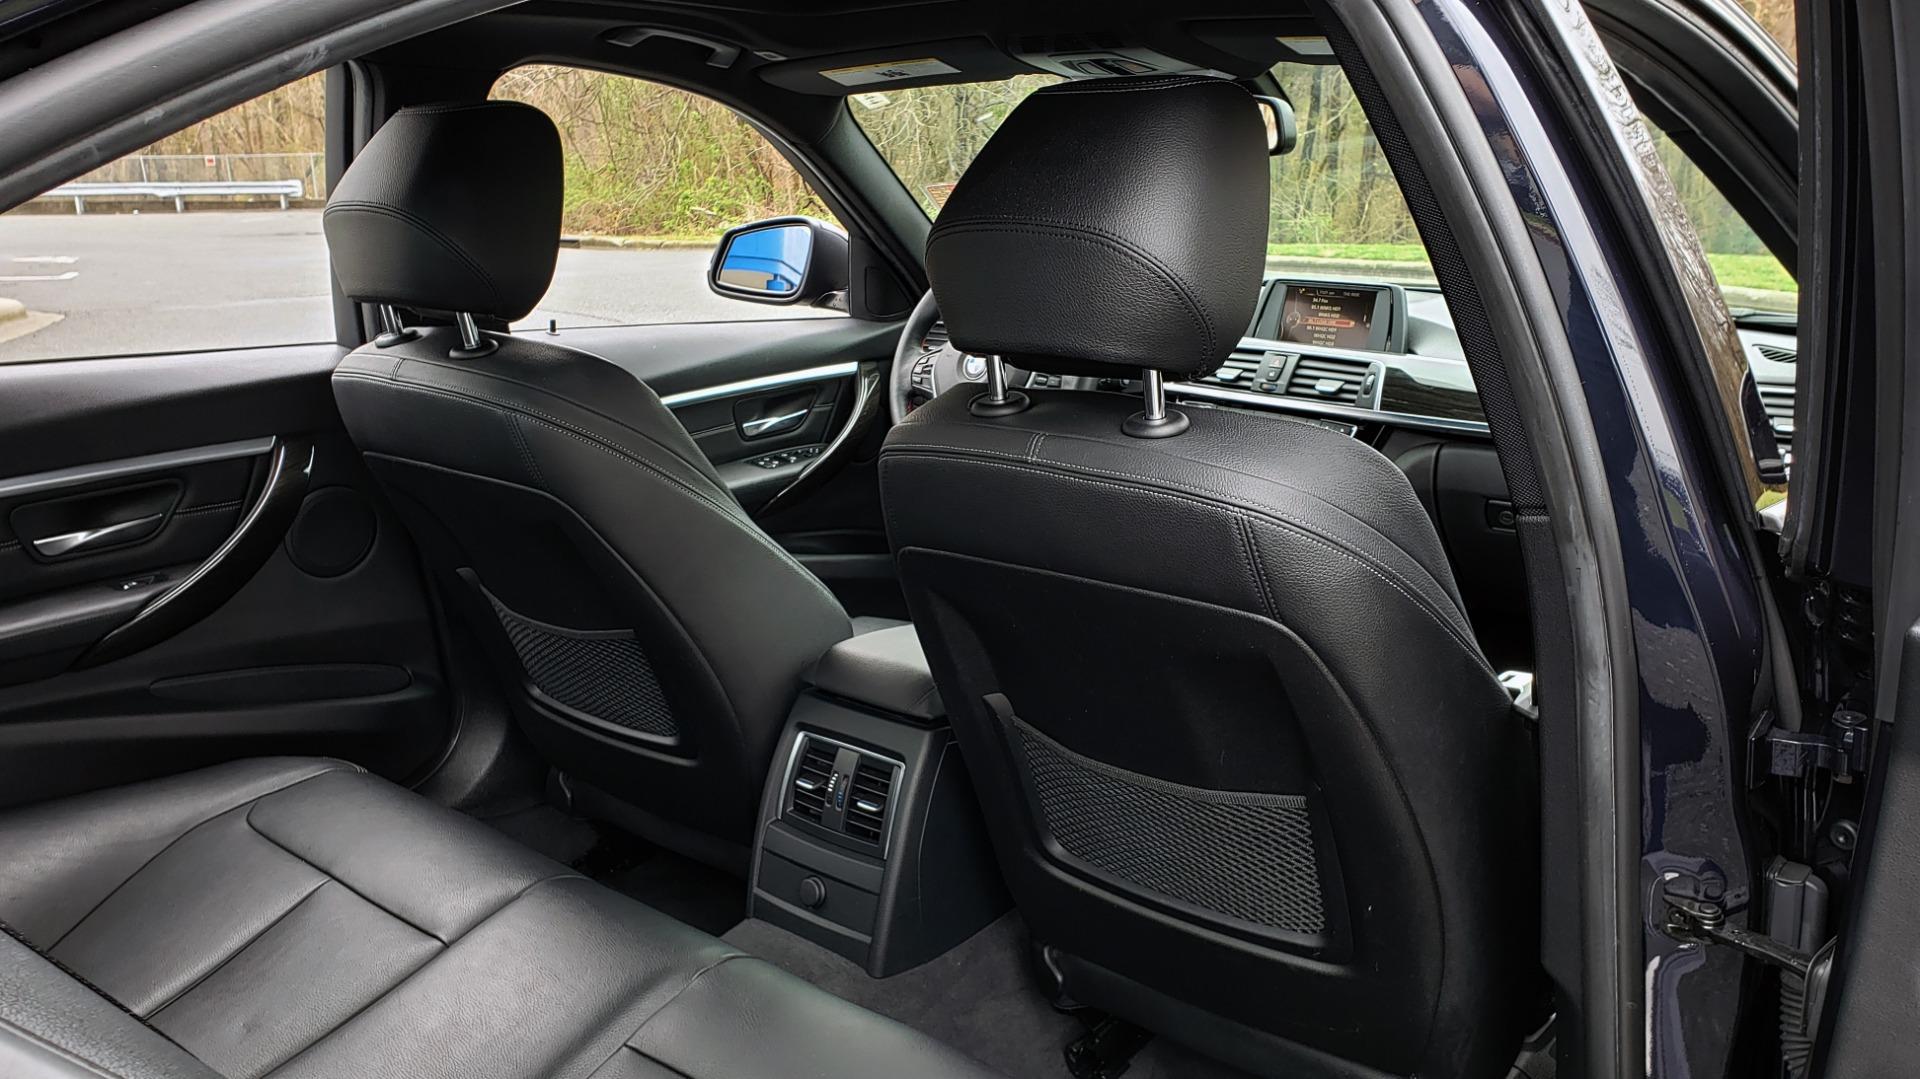 Used 2016 BMW 3 SERIES 328I PREMIUM PKG / DRVR ASST / SUNROOF / PARK ASST for sale Sold at Formula Imports in Charlotte NC 28227 69